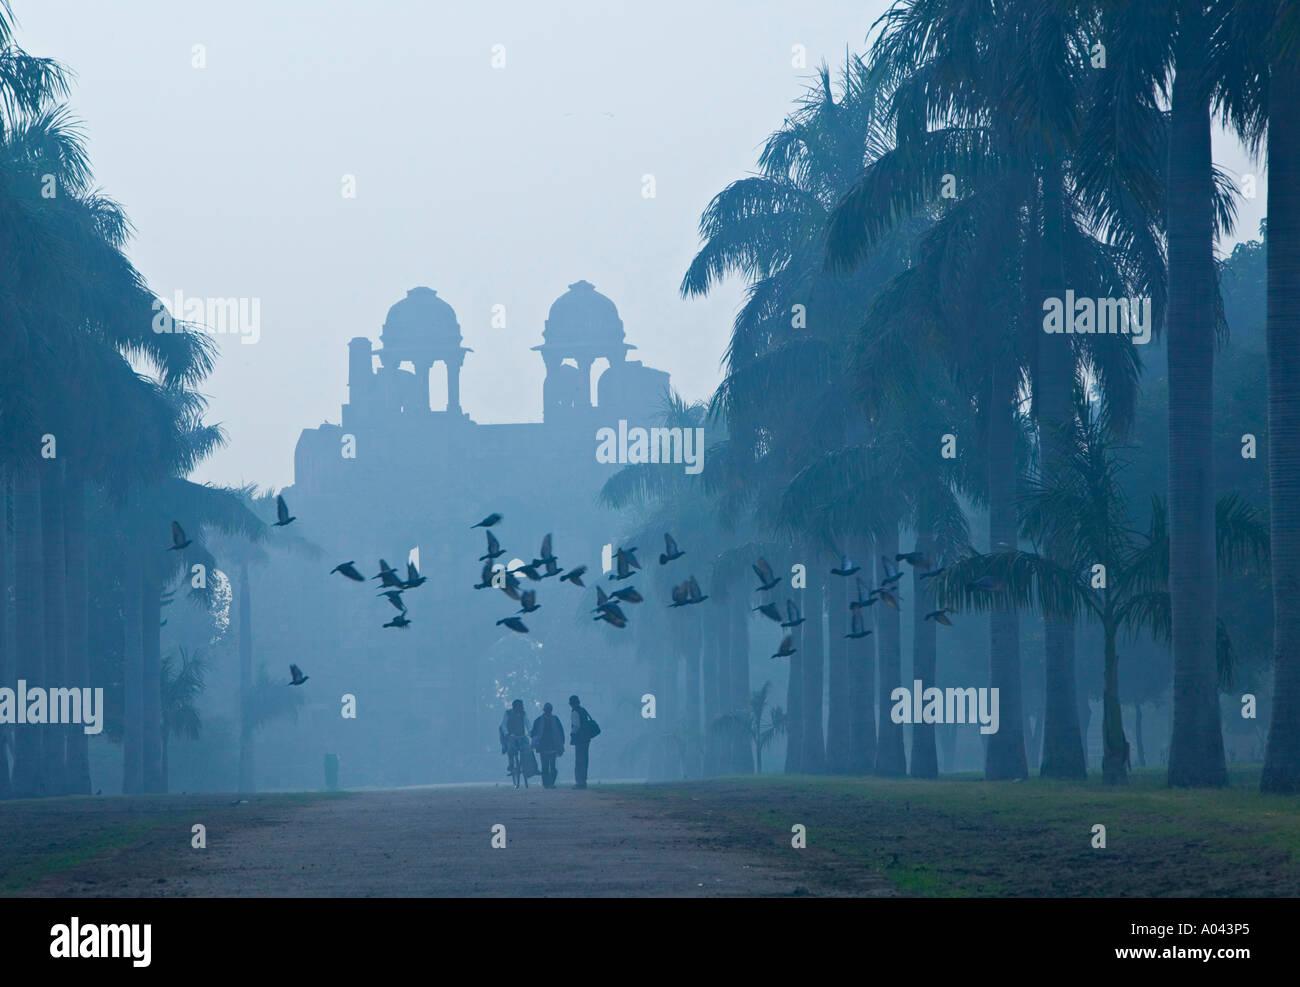 Purana Qila (antigua fortaleza construida por Sher Shar 1545), Nueva Delhi, India Imagen De Stock